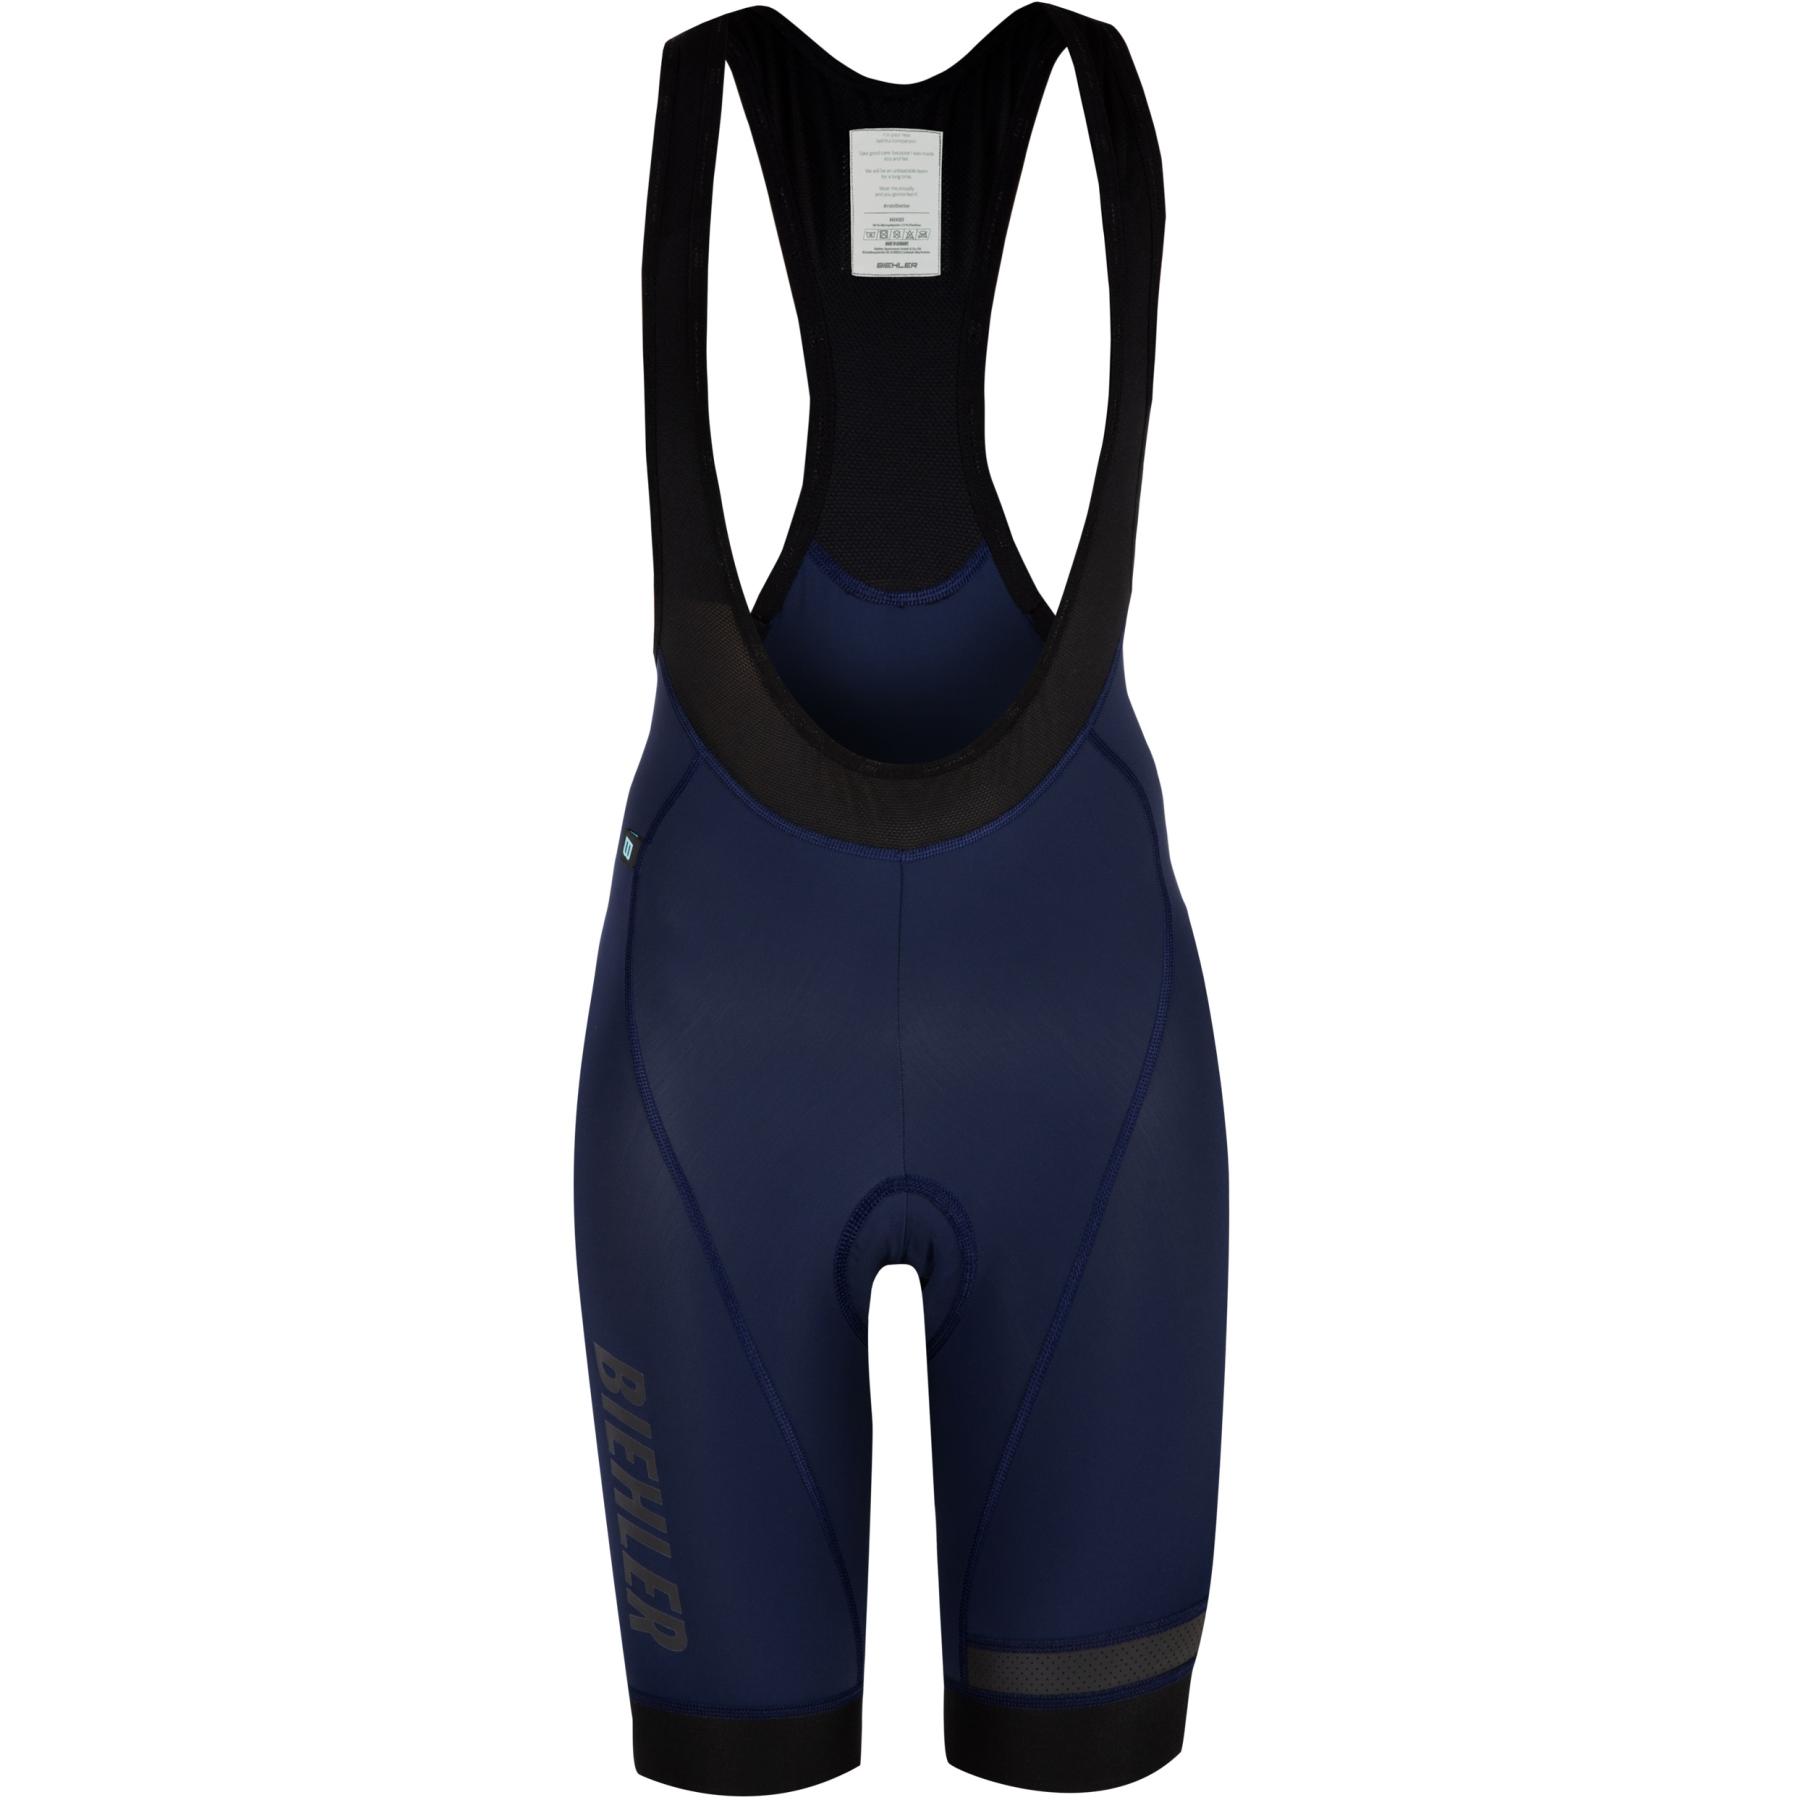 Biehler Neo Classic Signature³ Bib Shorts Women - night blue